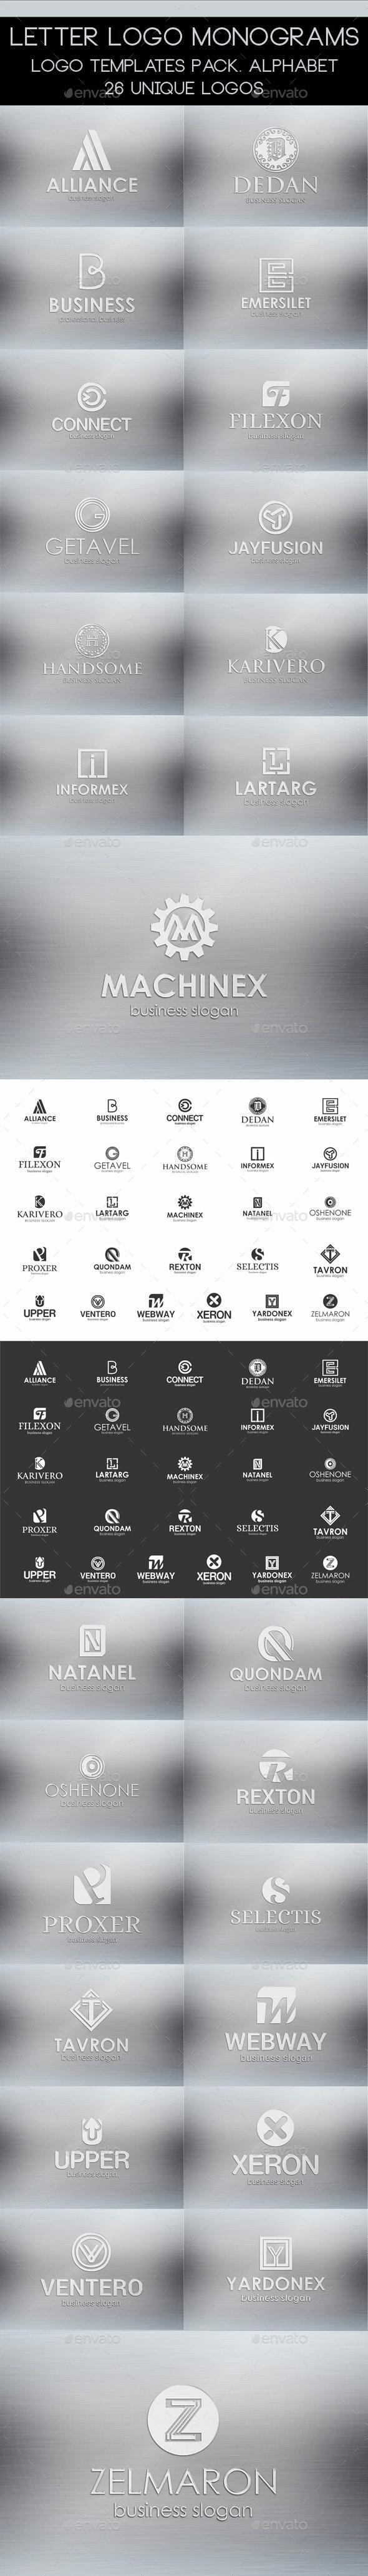 Logos | Letter Logo Monogrames Templates Pack - Badges & Stickers Web Elements